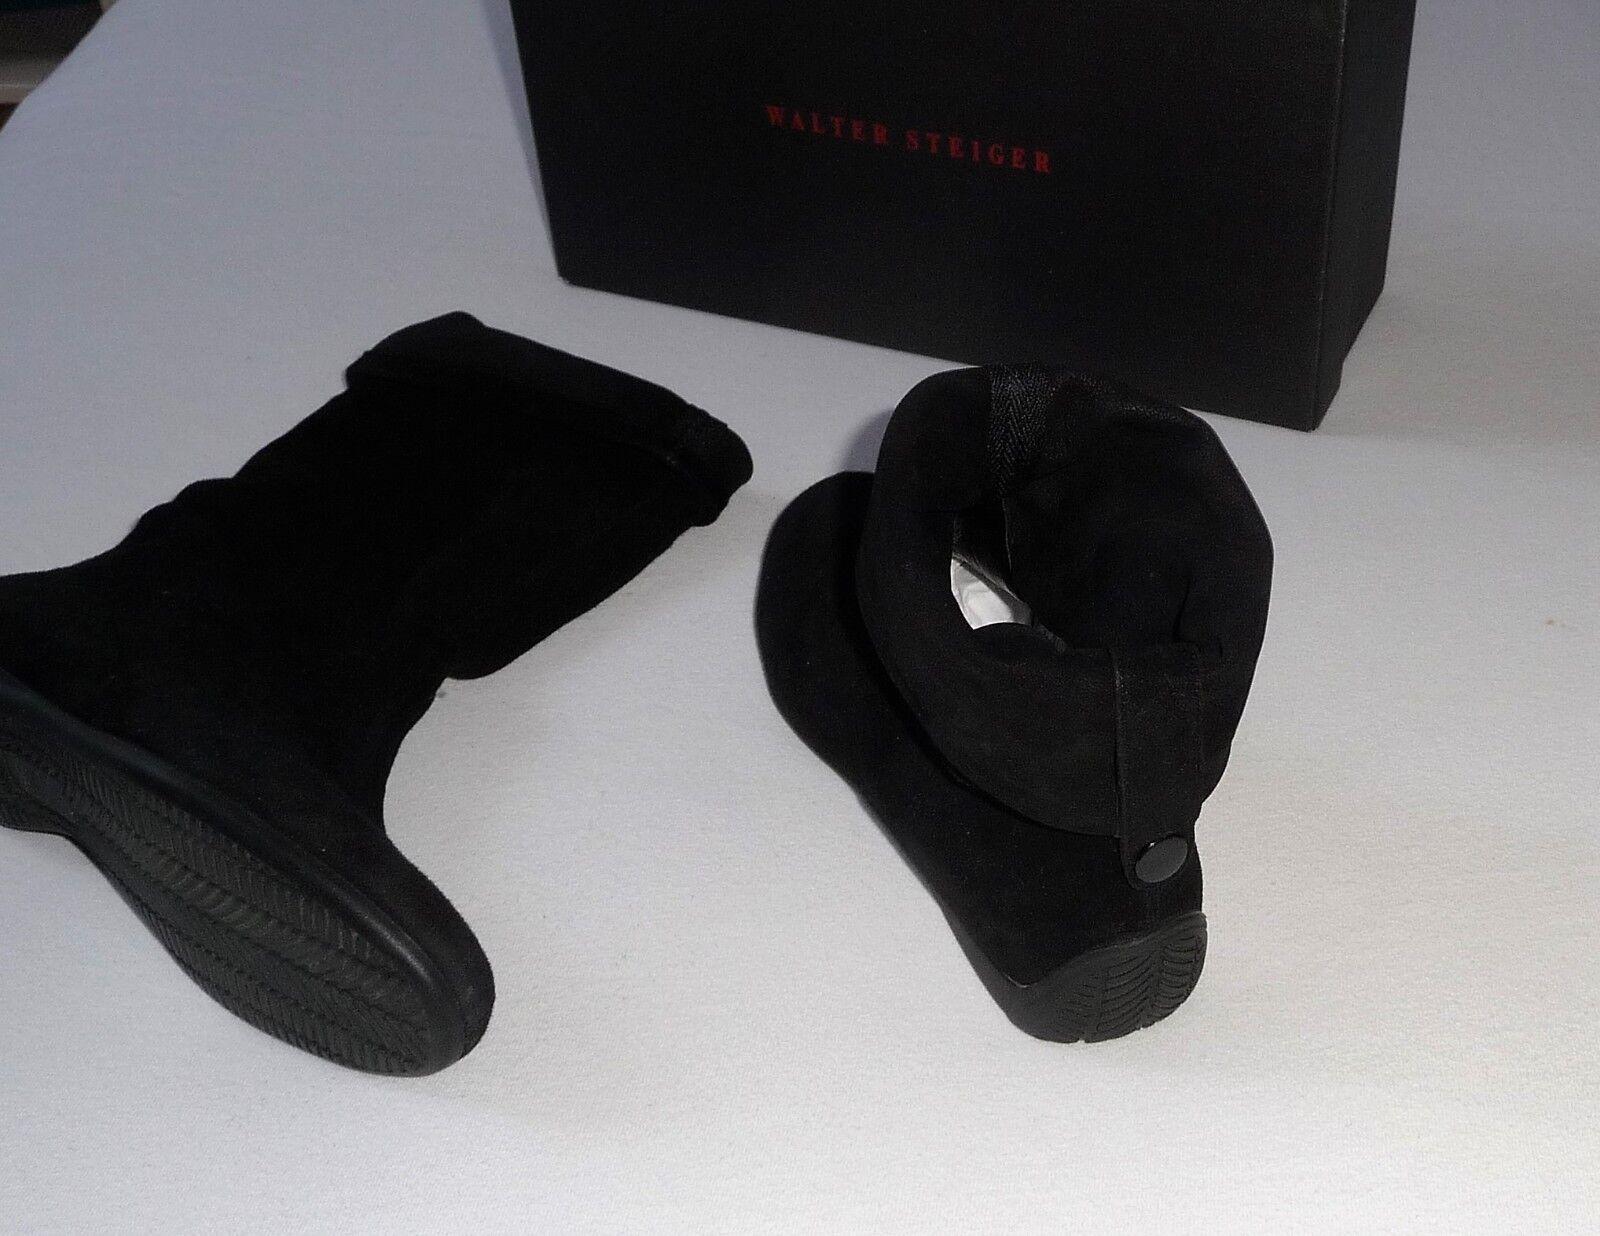 WALTER STEIGER chaussures démarrageies démarrageies démarrageies Bottines Taille 35 à Skinny, Shorts np319, - article NEUF a467ab